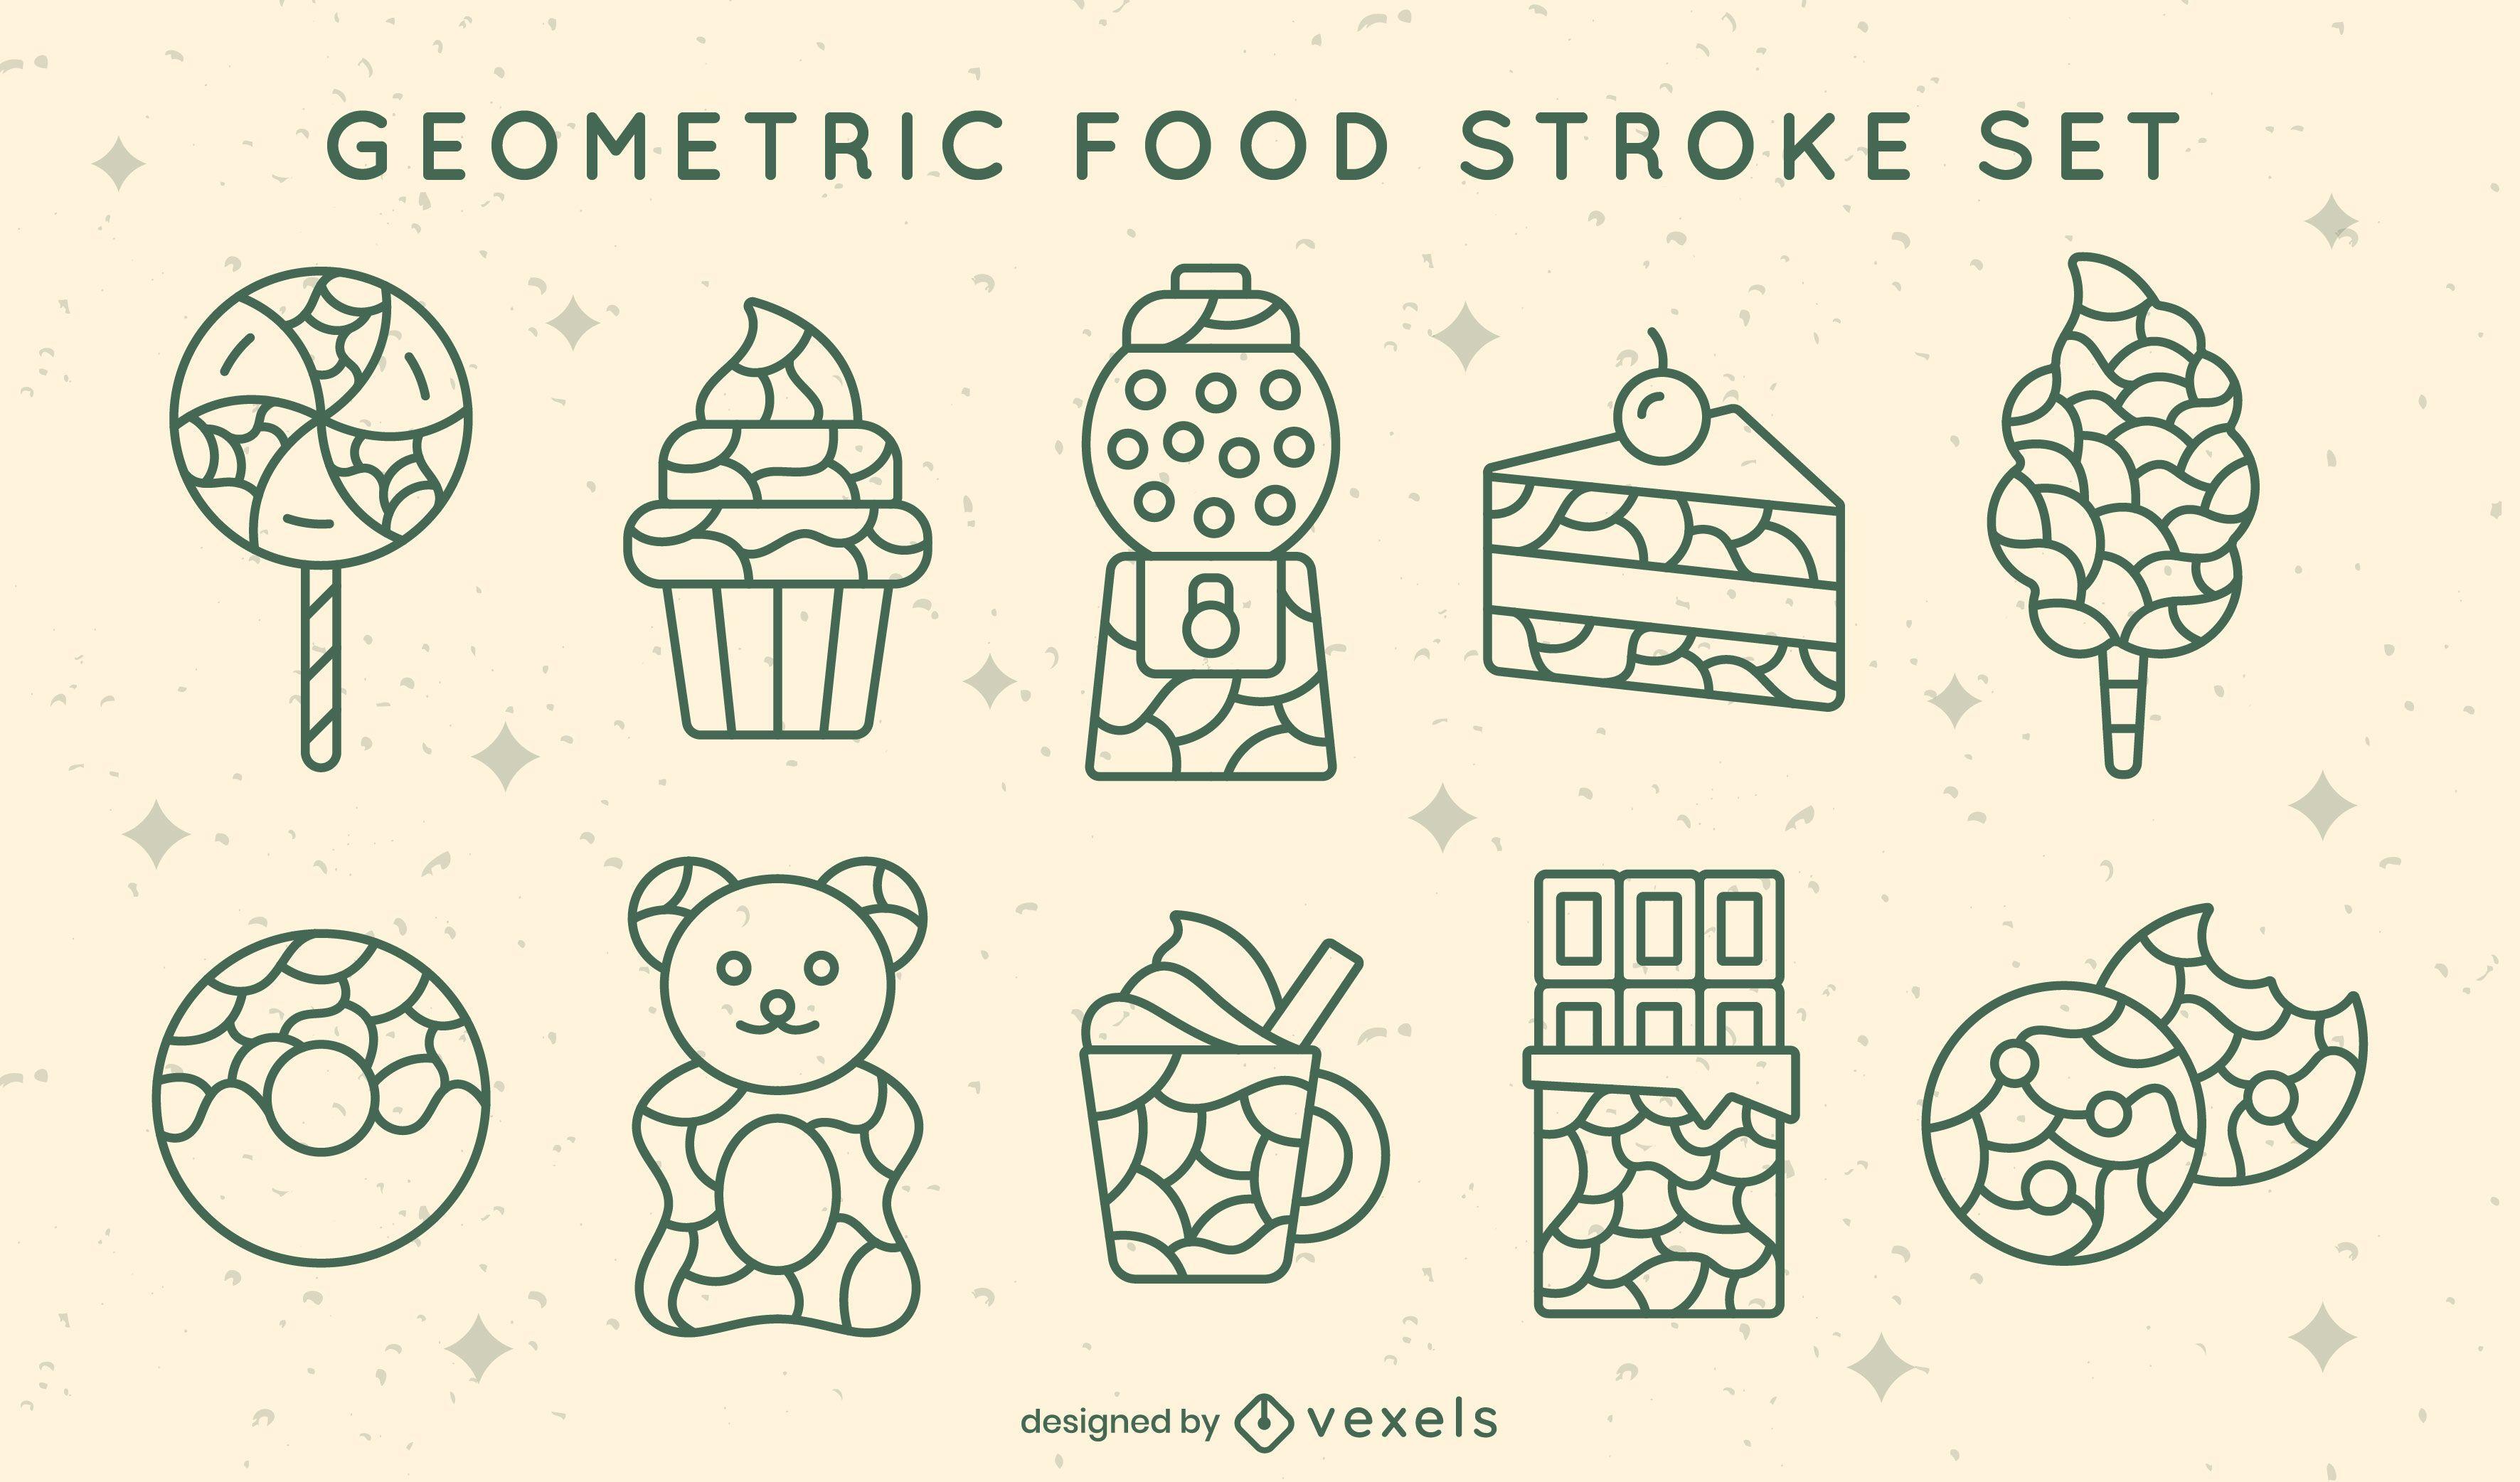 Geometric food stroke set